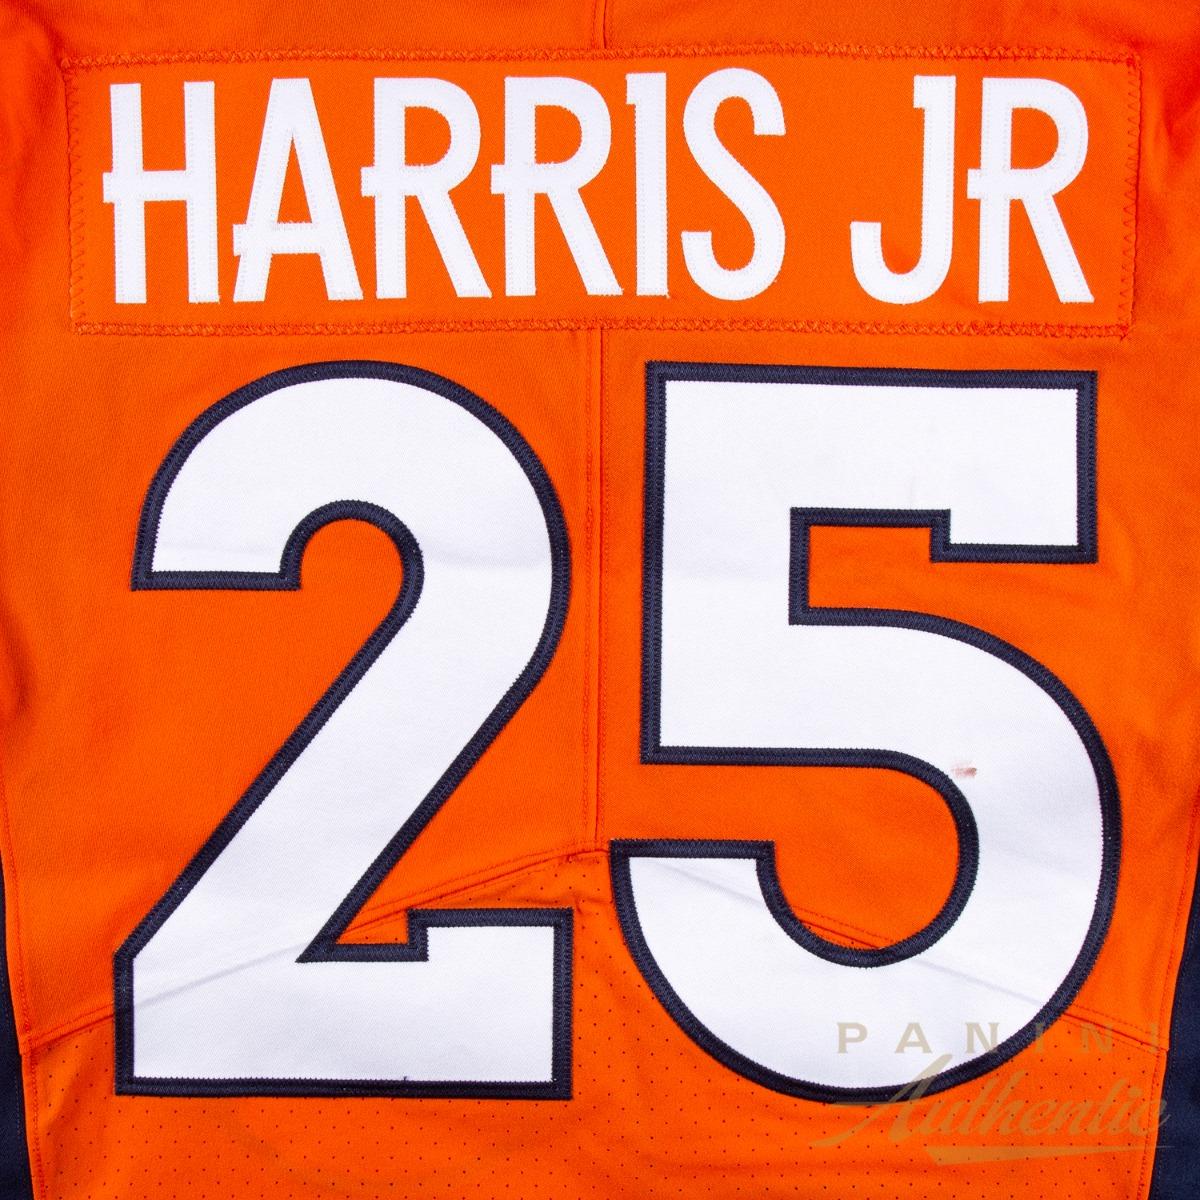 Chris Harris Jr. Game Worn Jersey From 9.29.19 vs JAX ~Limited ...